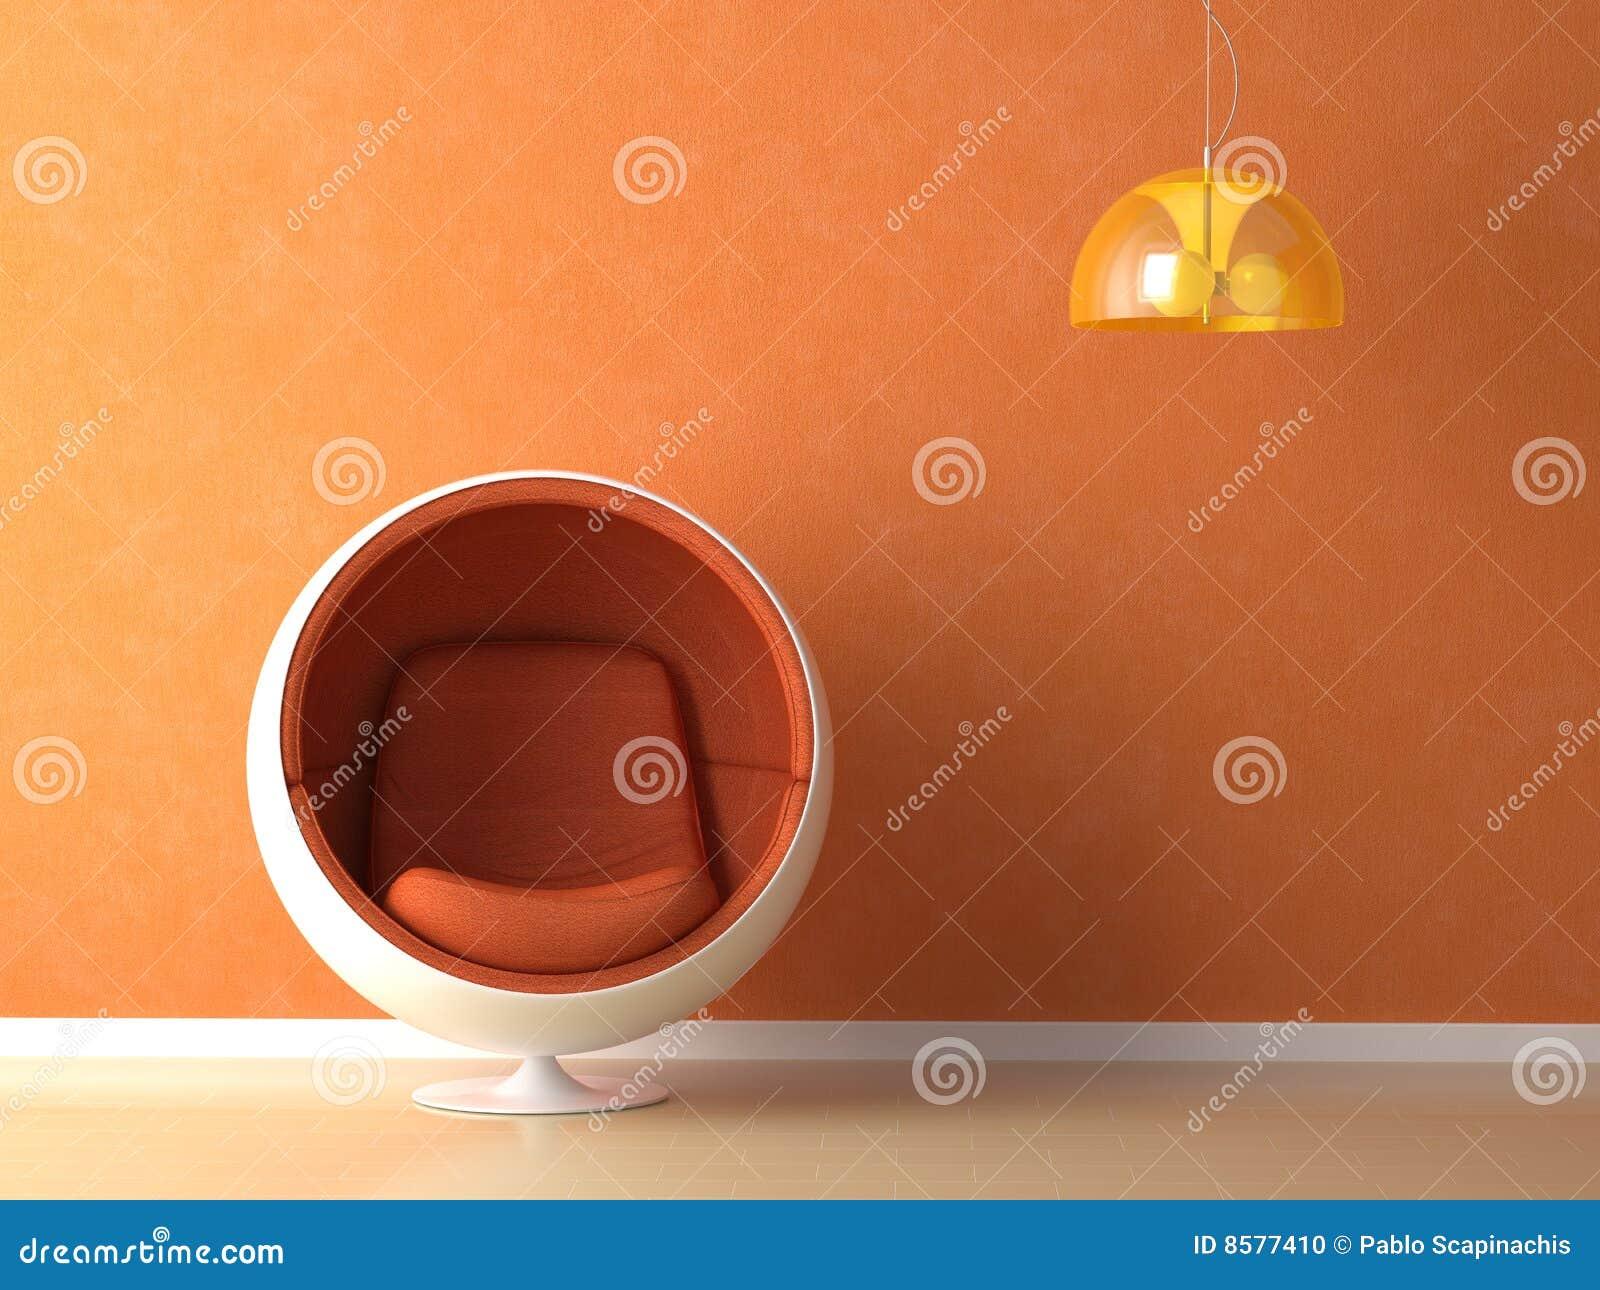 orange wall interior design stock photo - image: 8577410